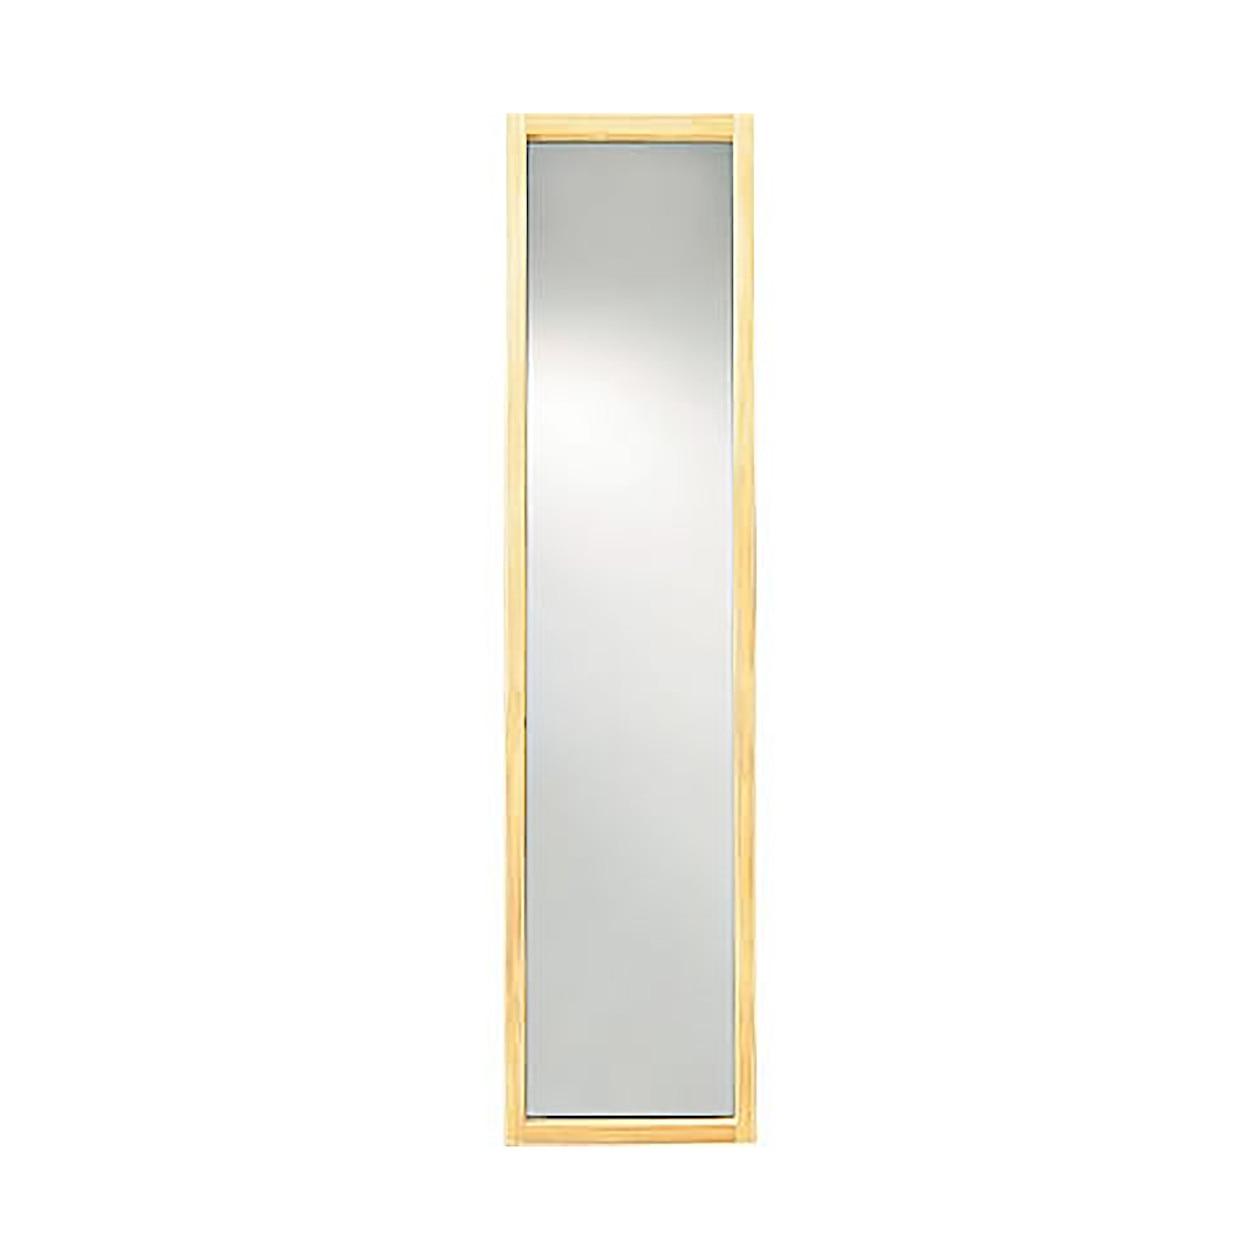 RoomClip商品情報 - パイン材ミラー